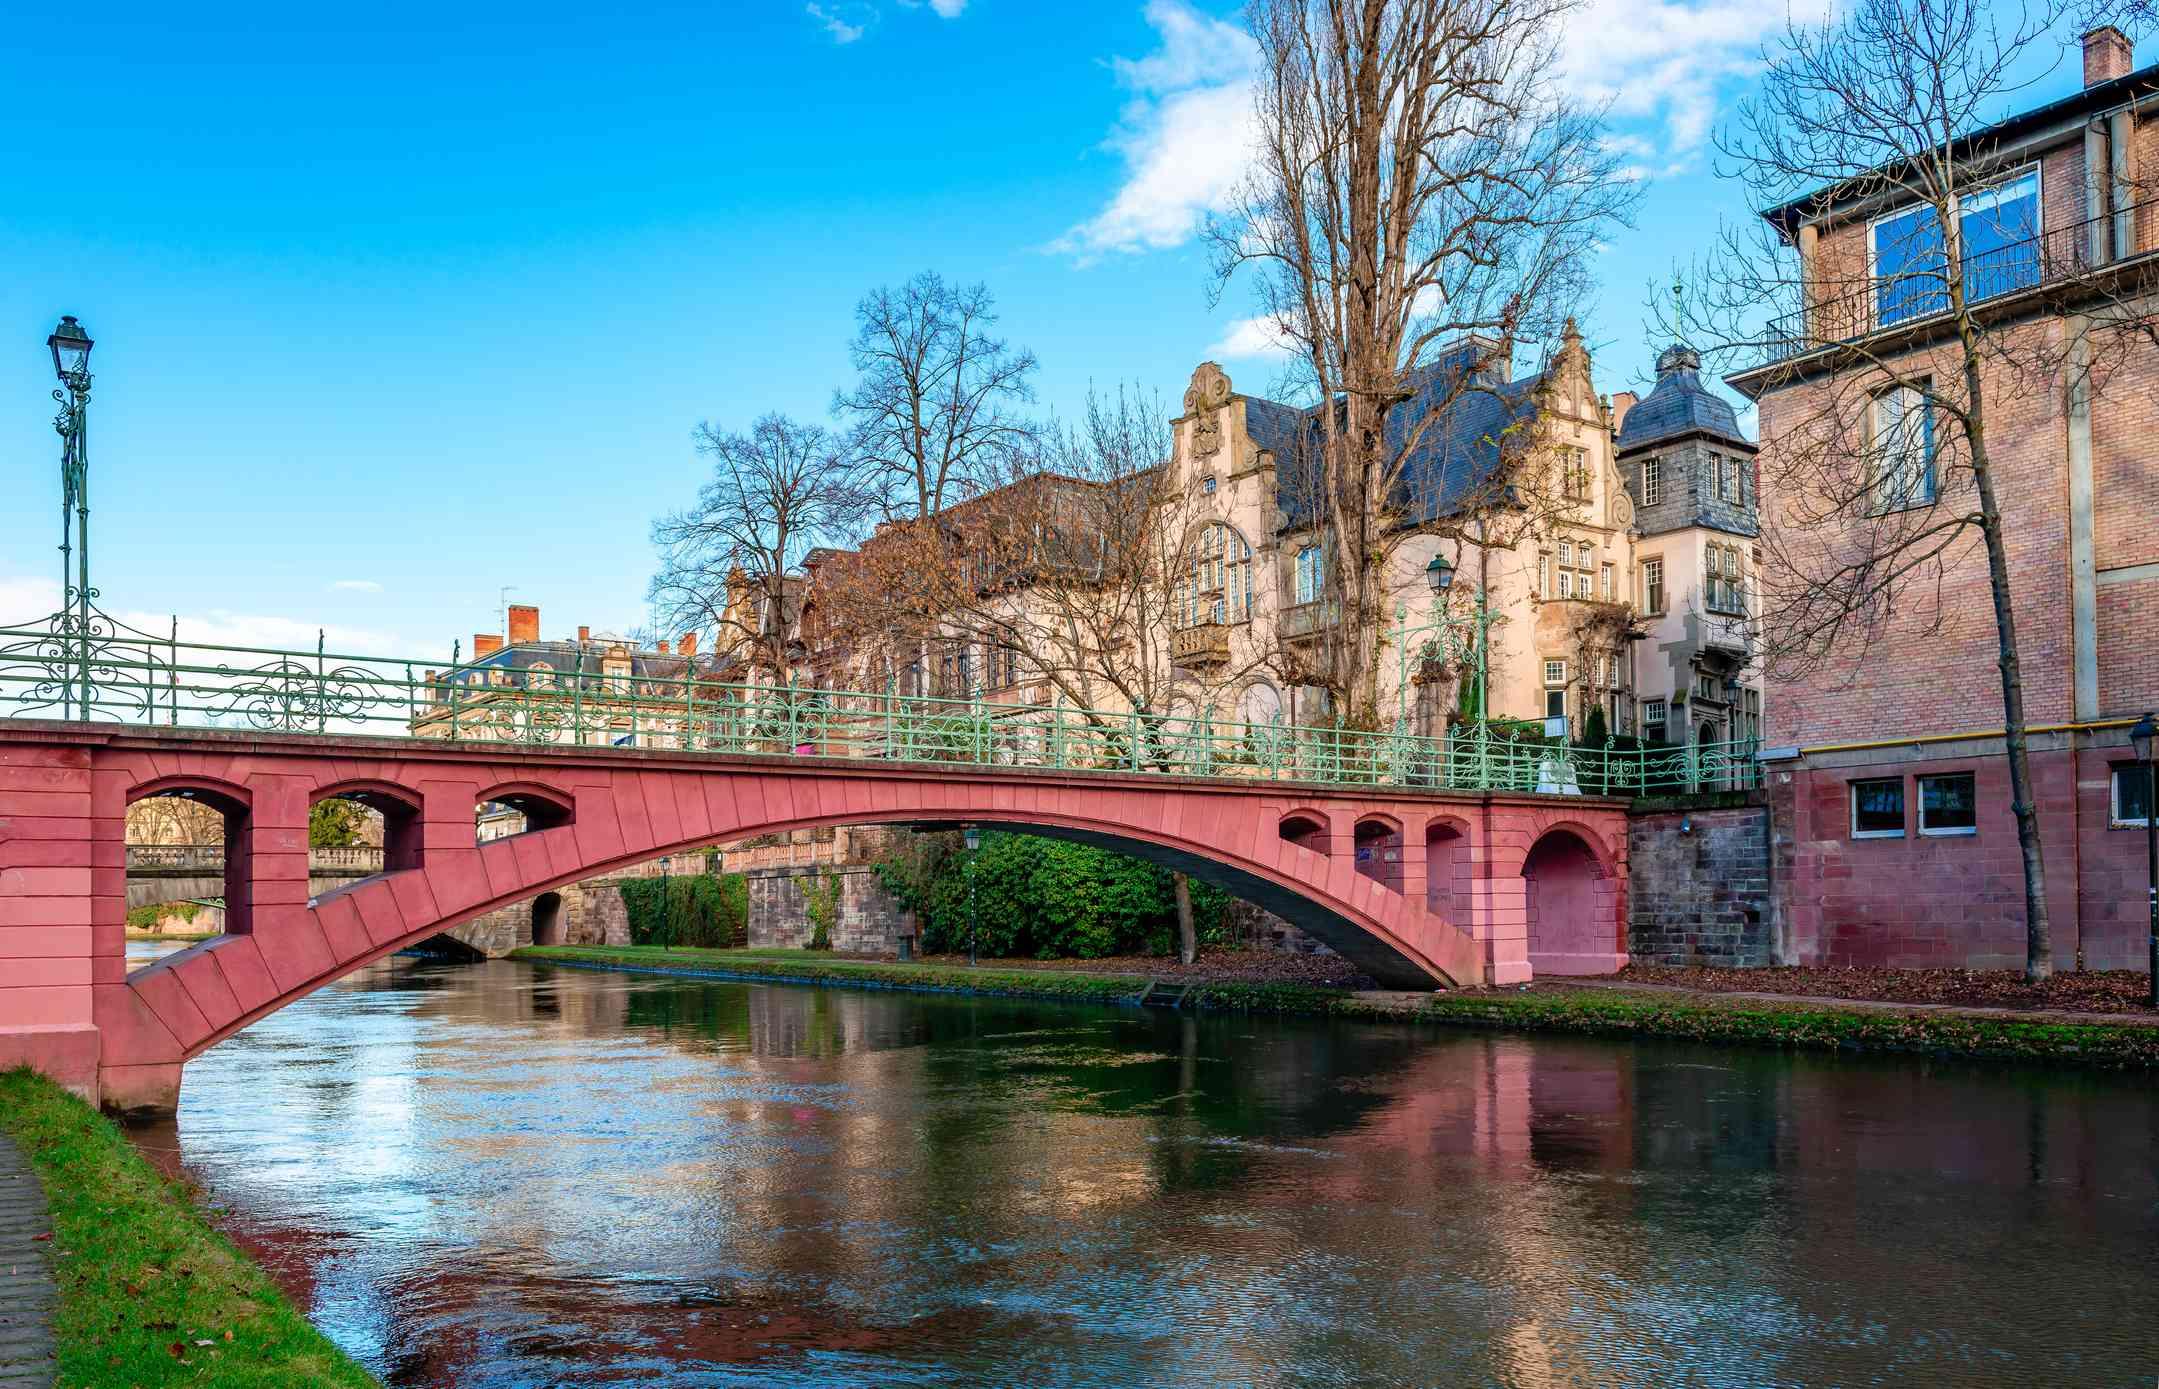 Footbridge in Neustadt, Strasbourg, France